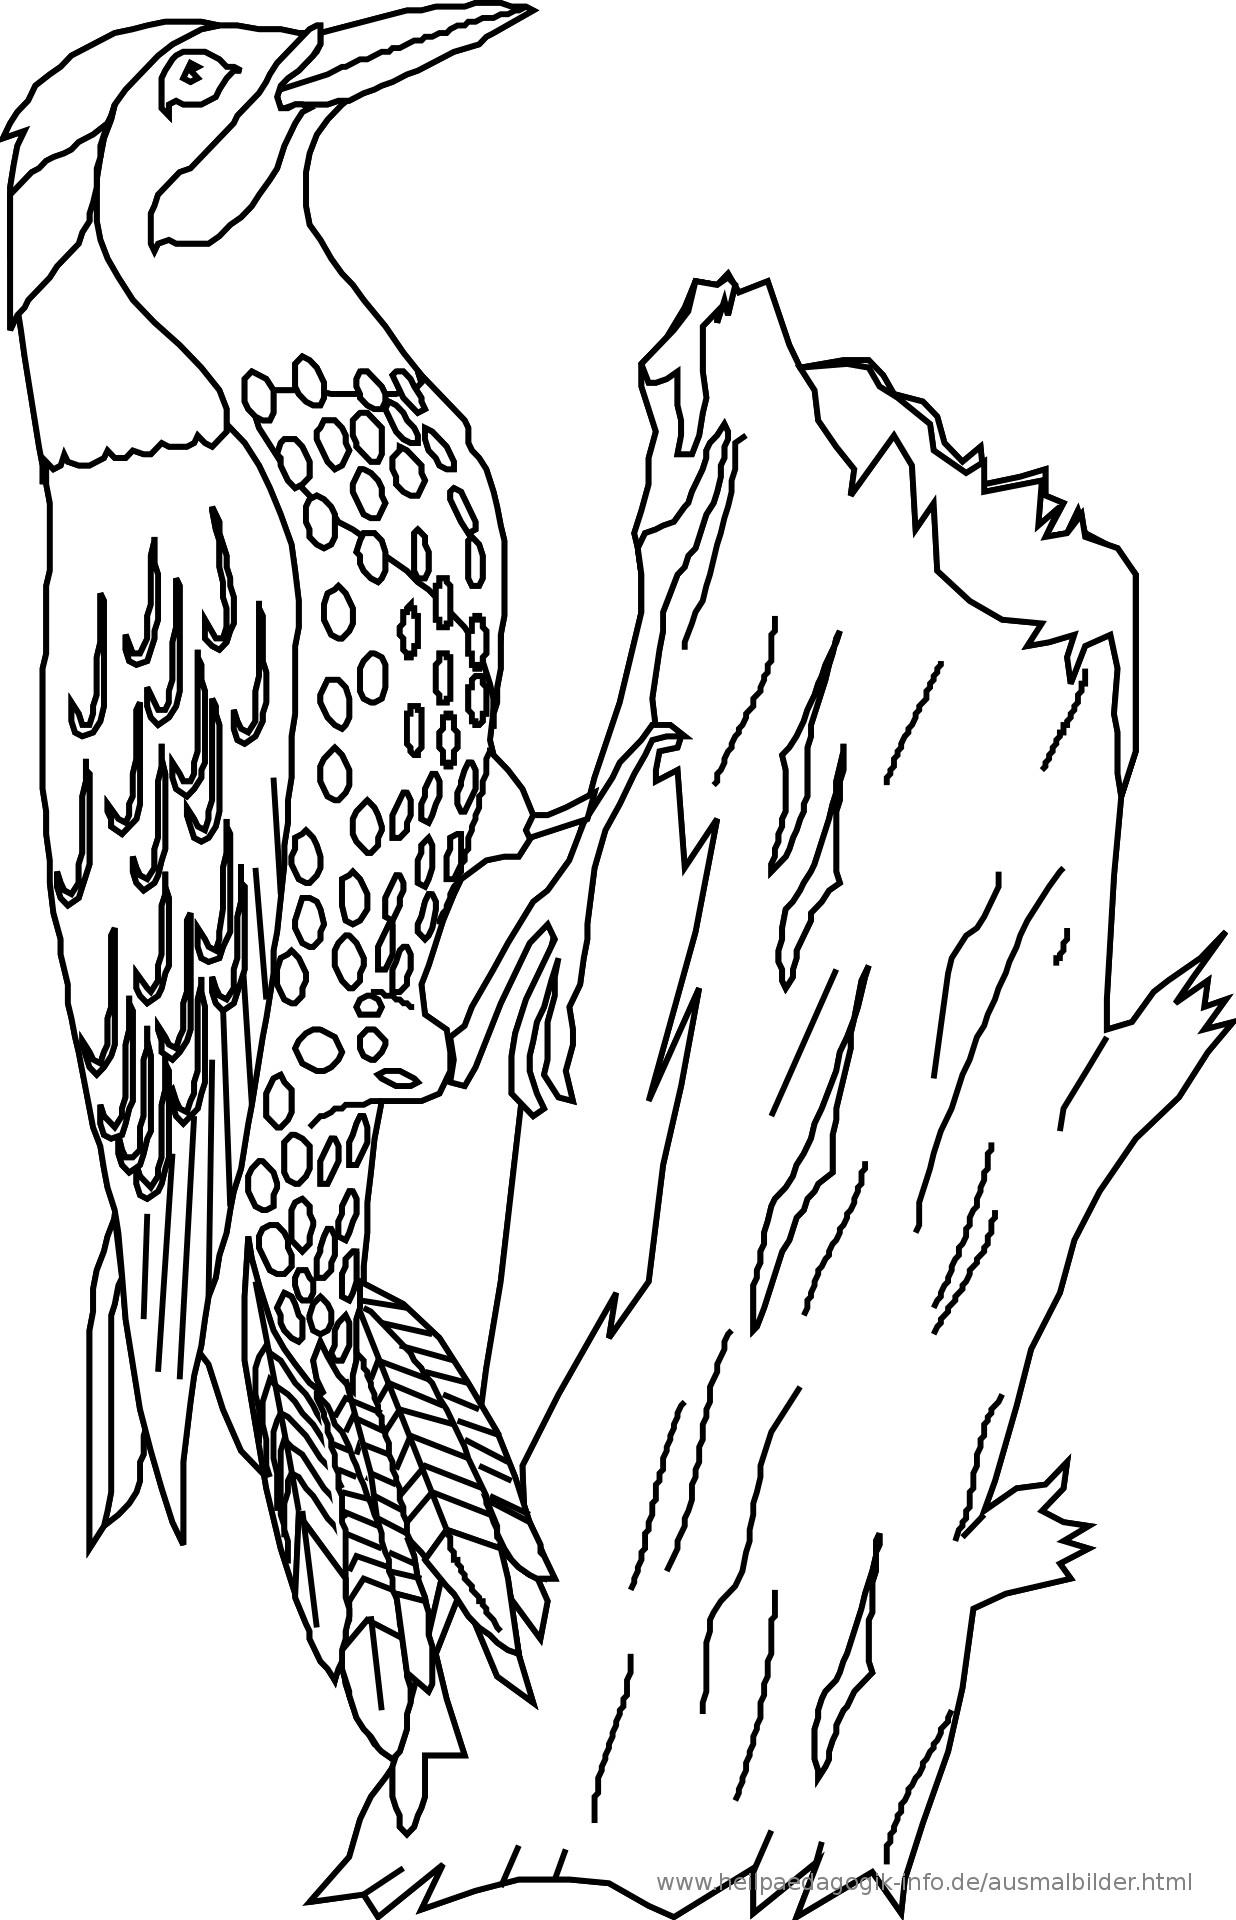 Vögel Ausmalbilder  Ausmalbilder Vögel